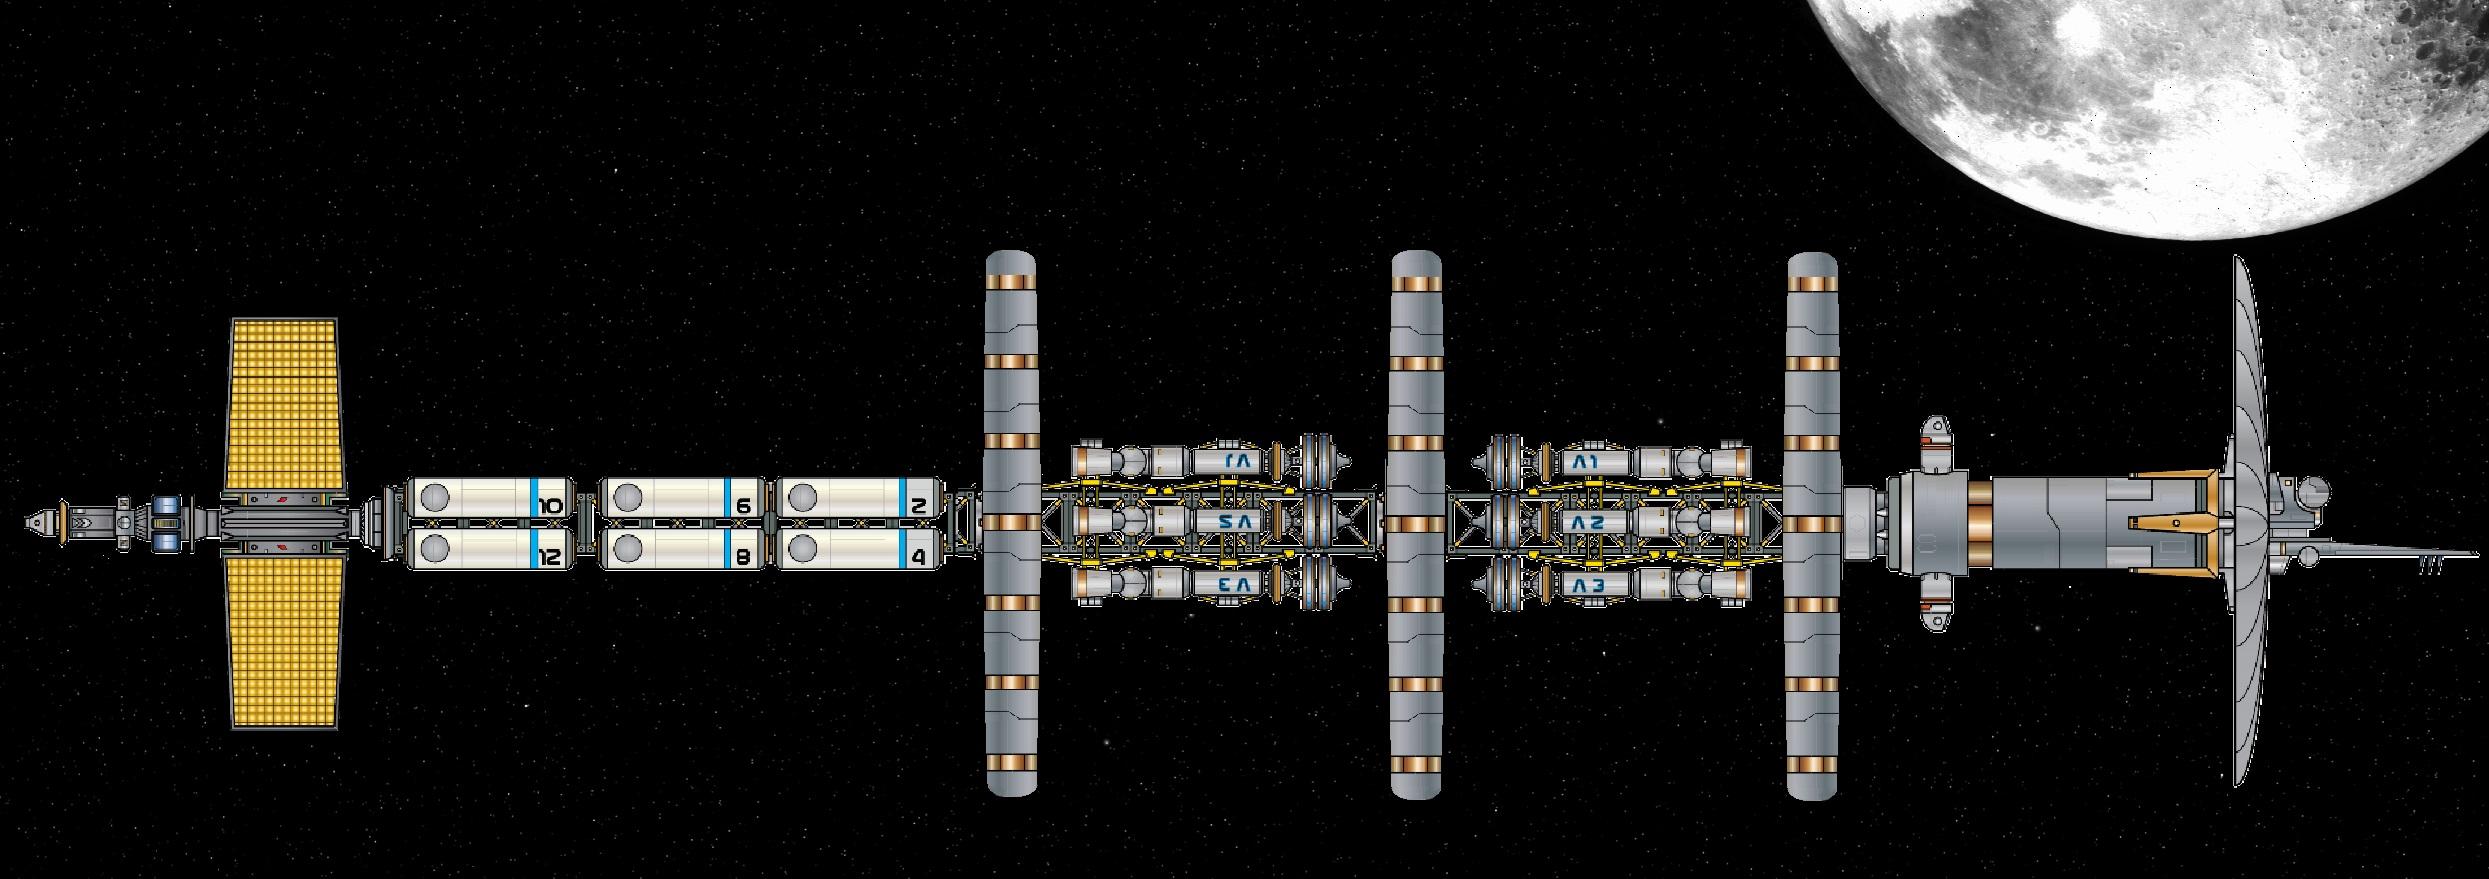 Daedalus_Starship_Deckplan_wiki.jpg